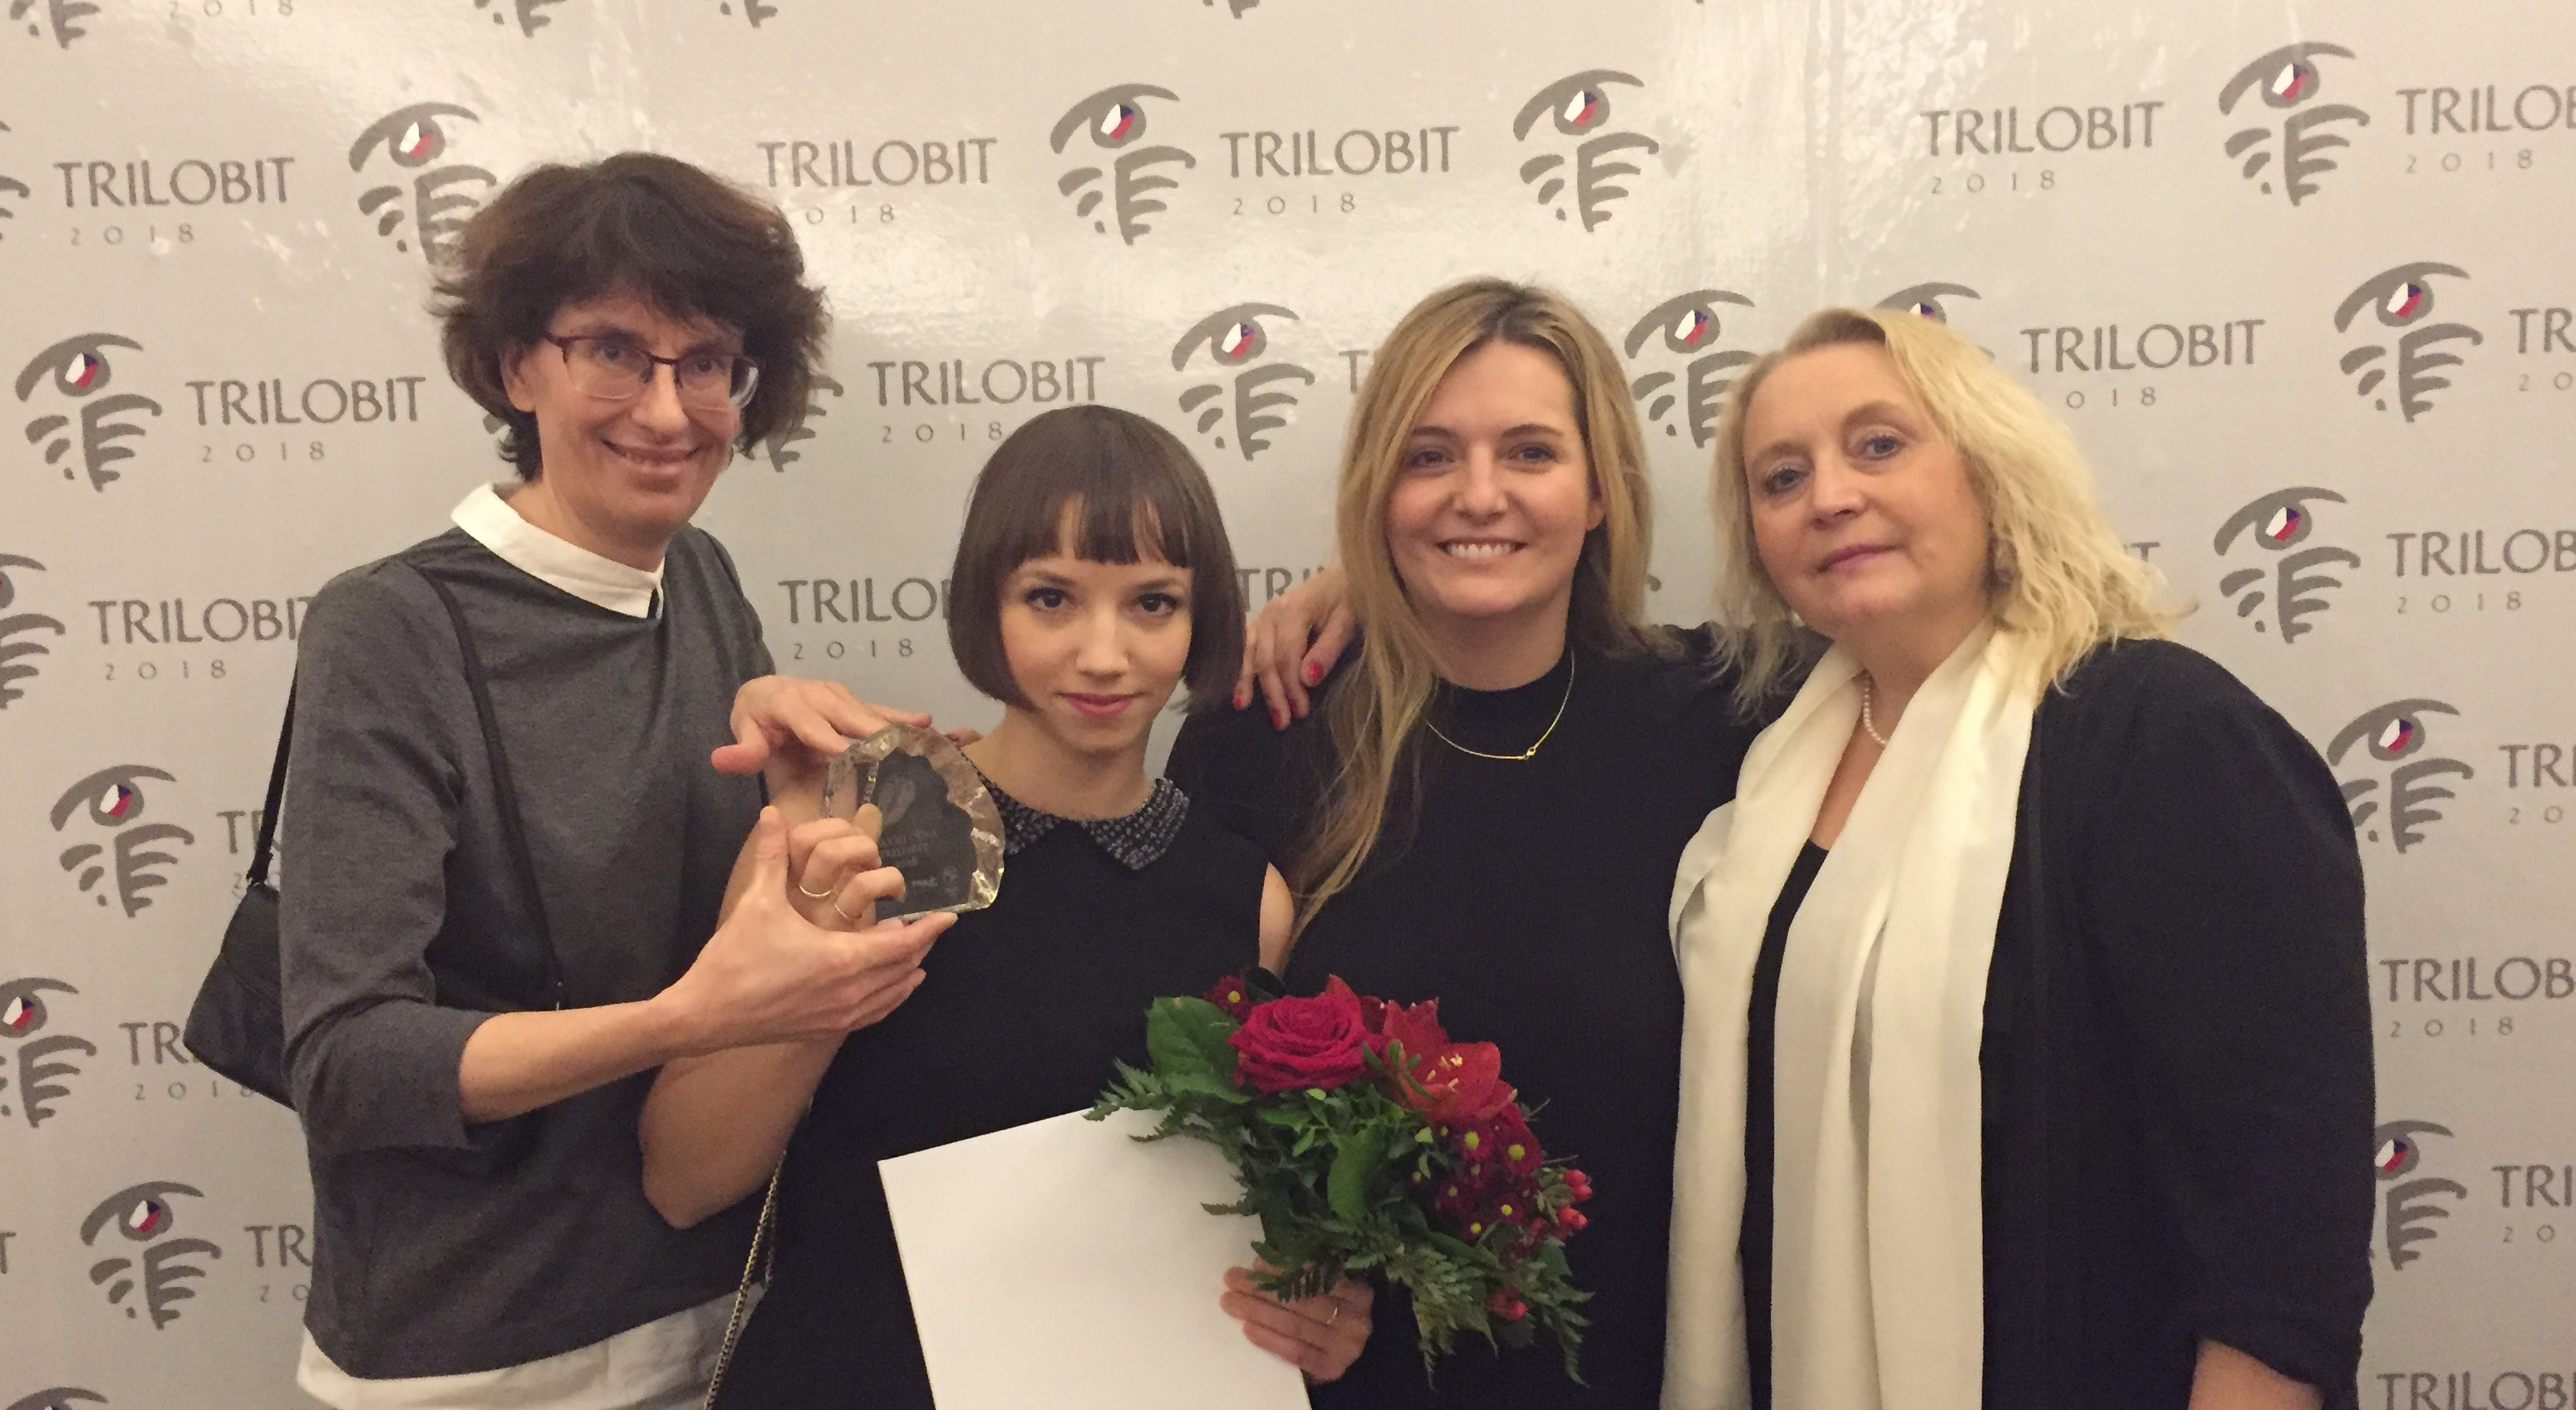 Dokument Mečiar získal Hlavnú cenu TRILOBIT 2018